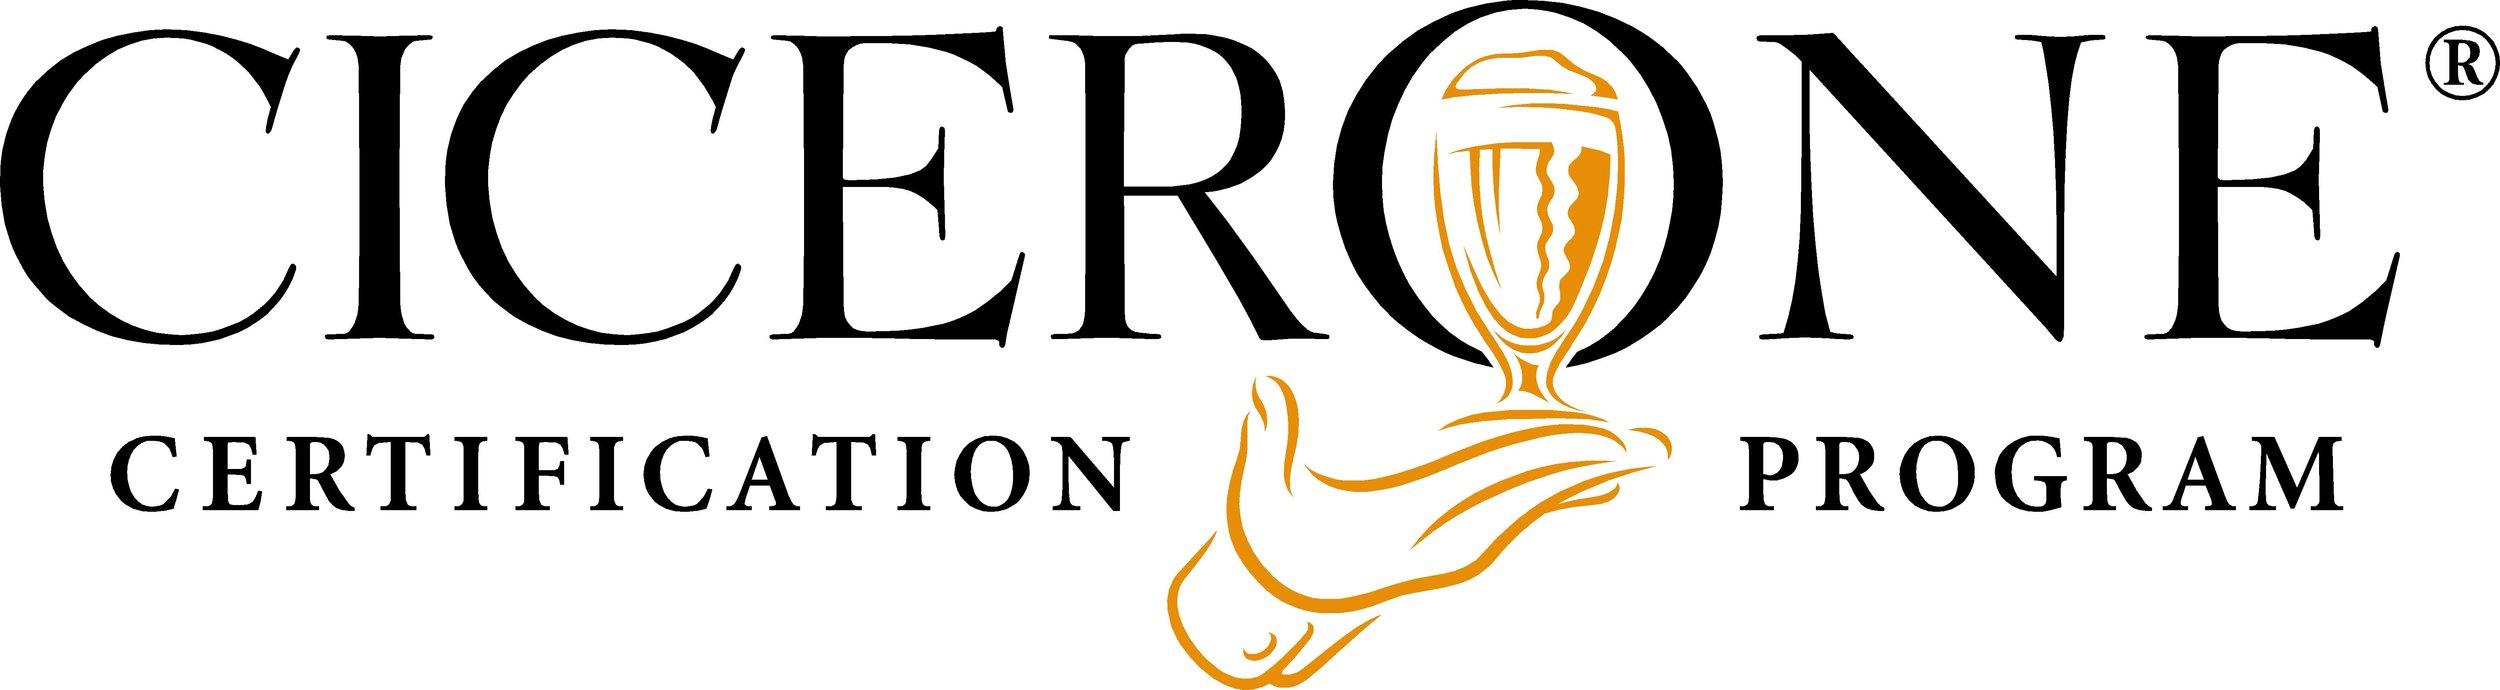 Cicerone-Logo-1.2-HR.jpg